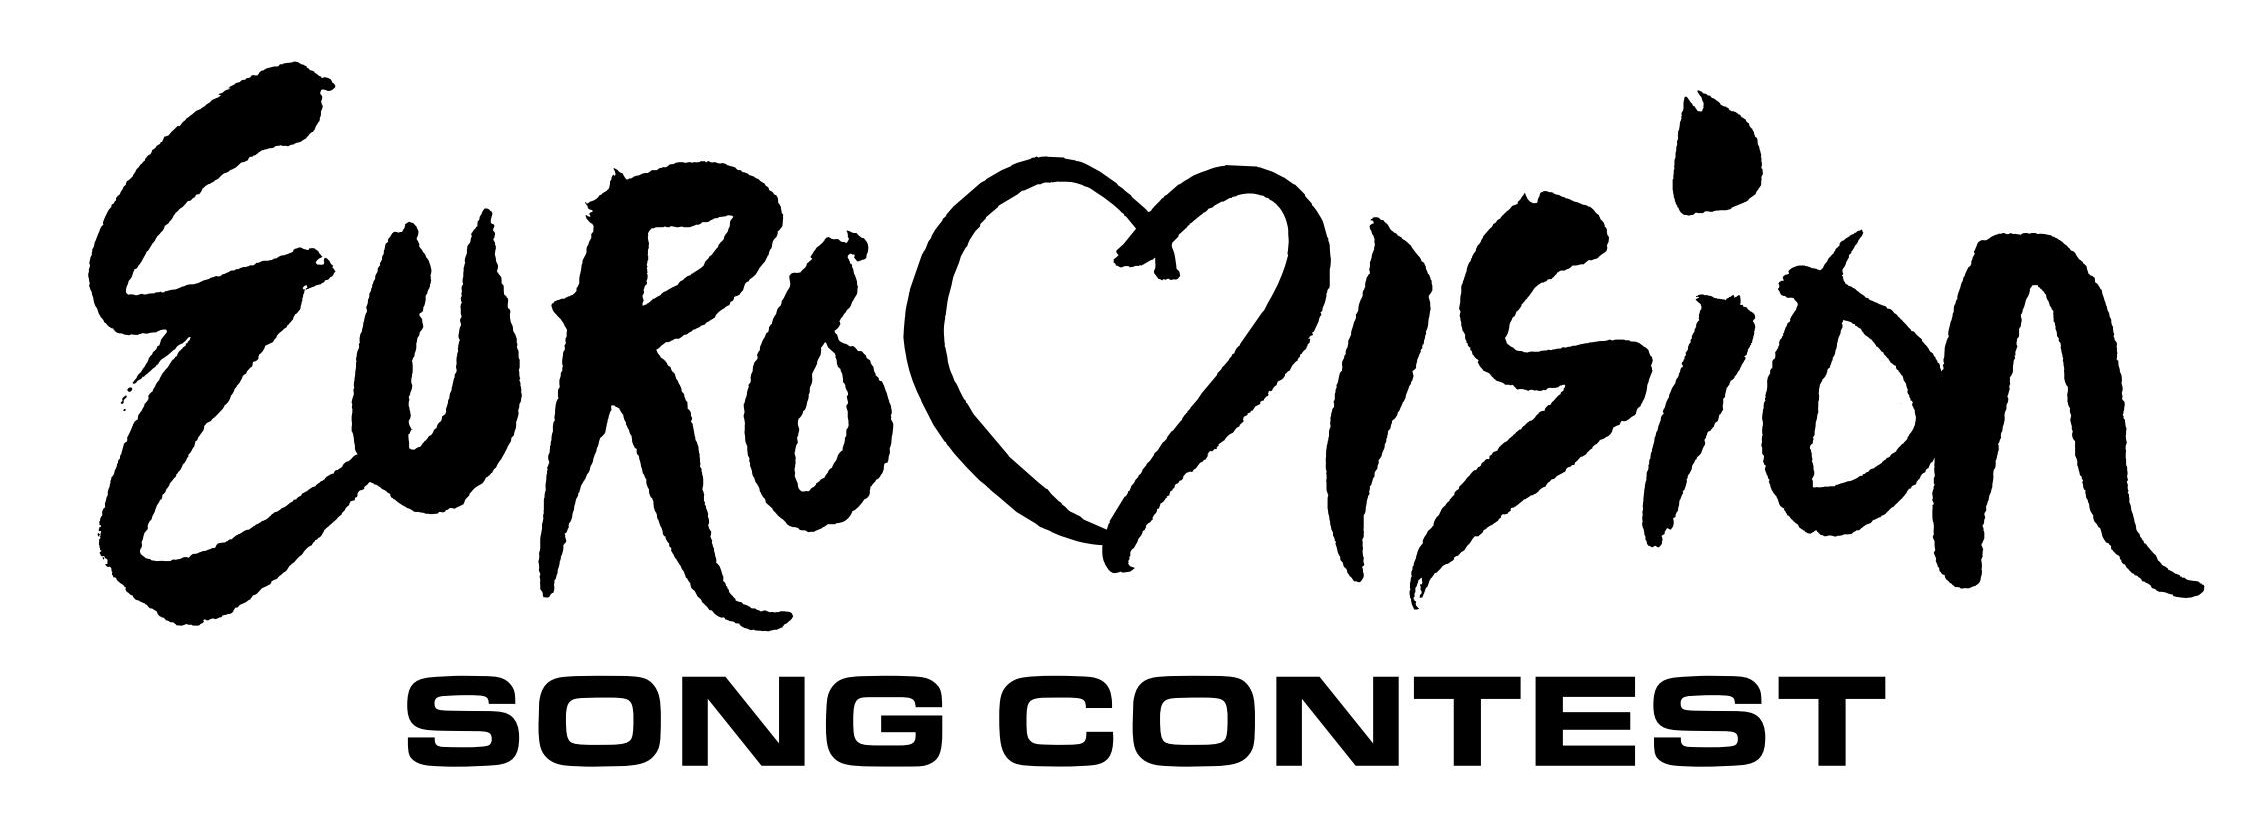 eurosong contest